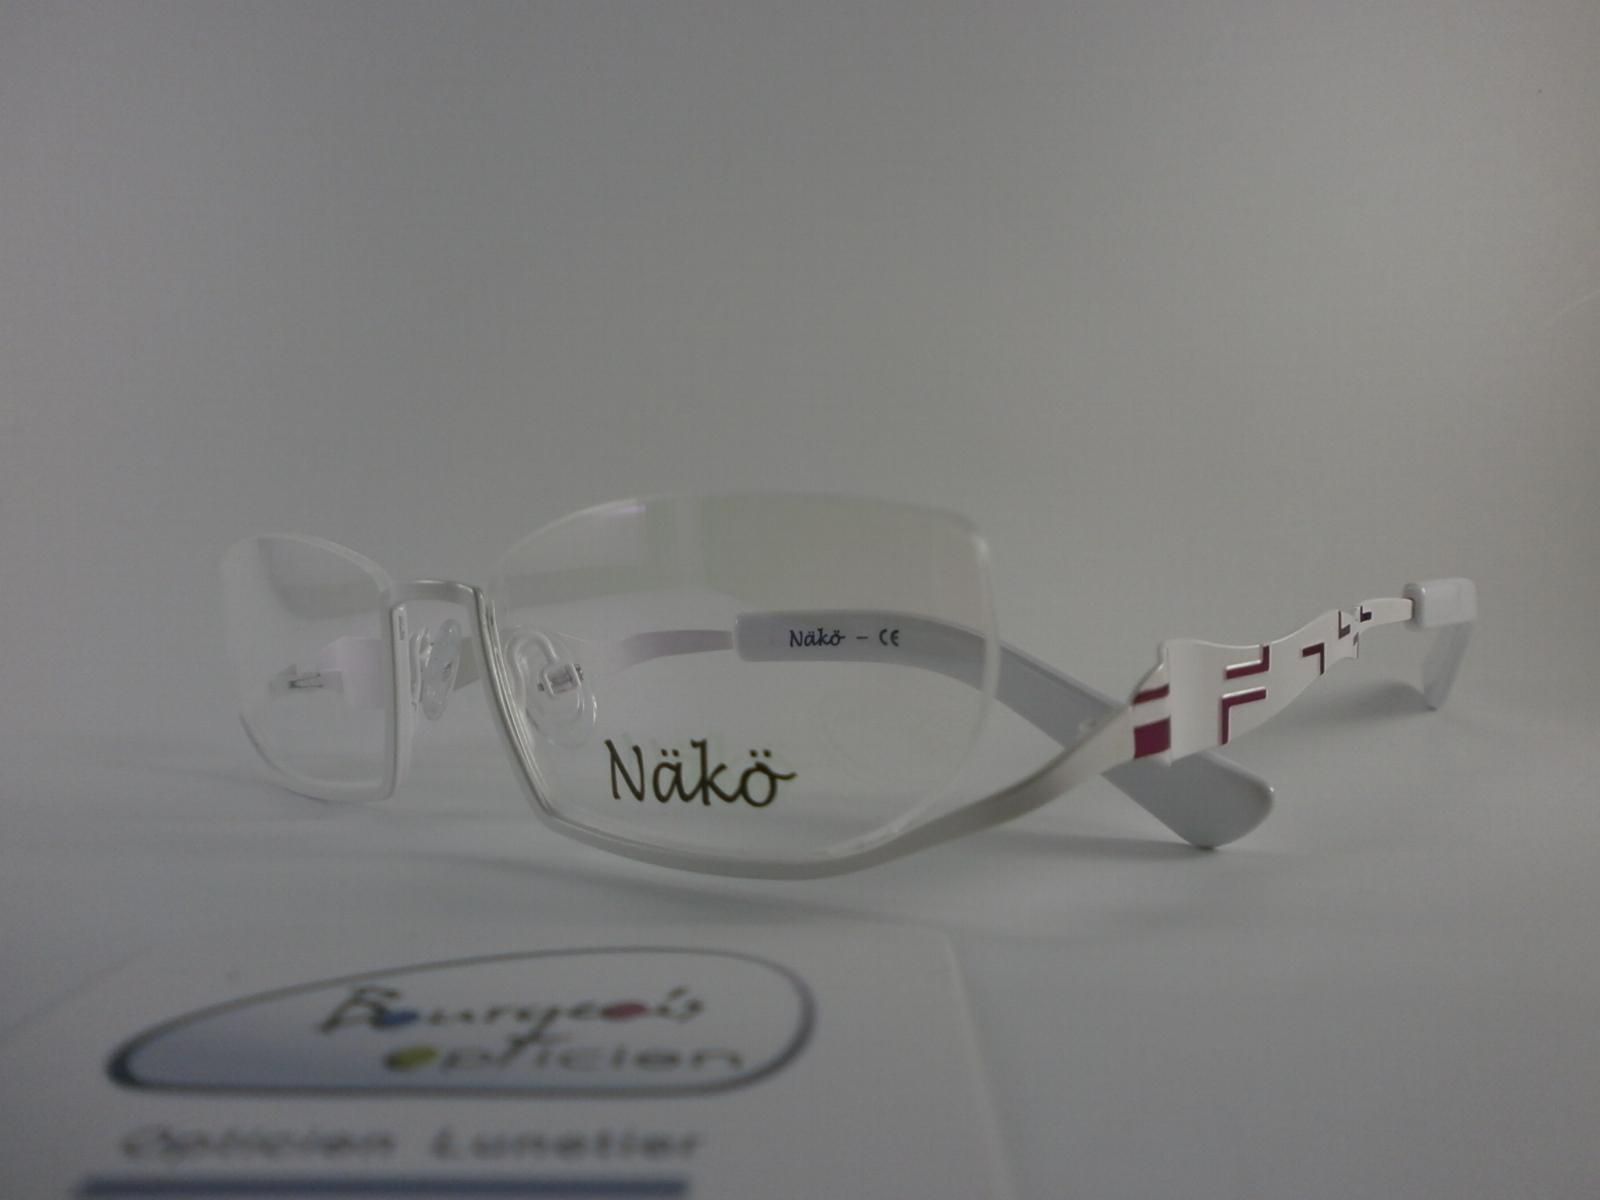 NAKO - Optique Bourgeois Muzillac - Morbihan 56 e2e2504da32c